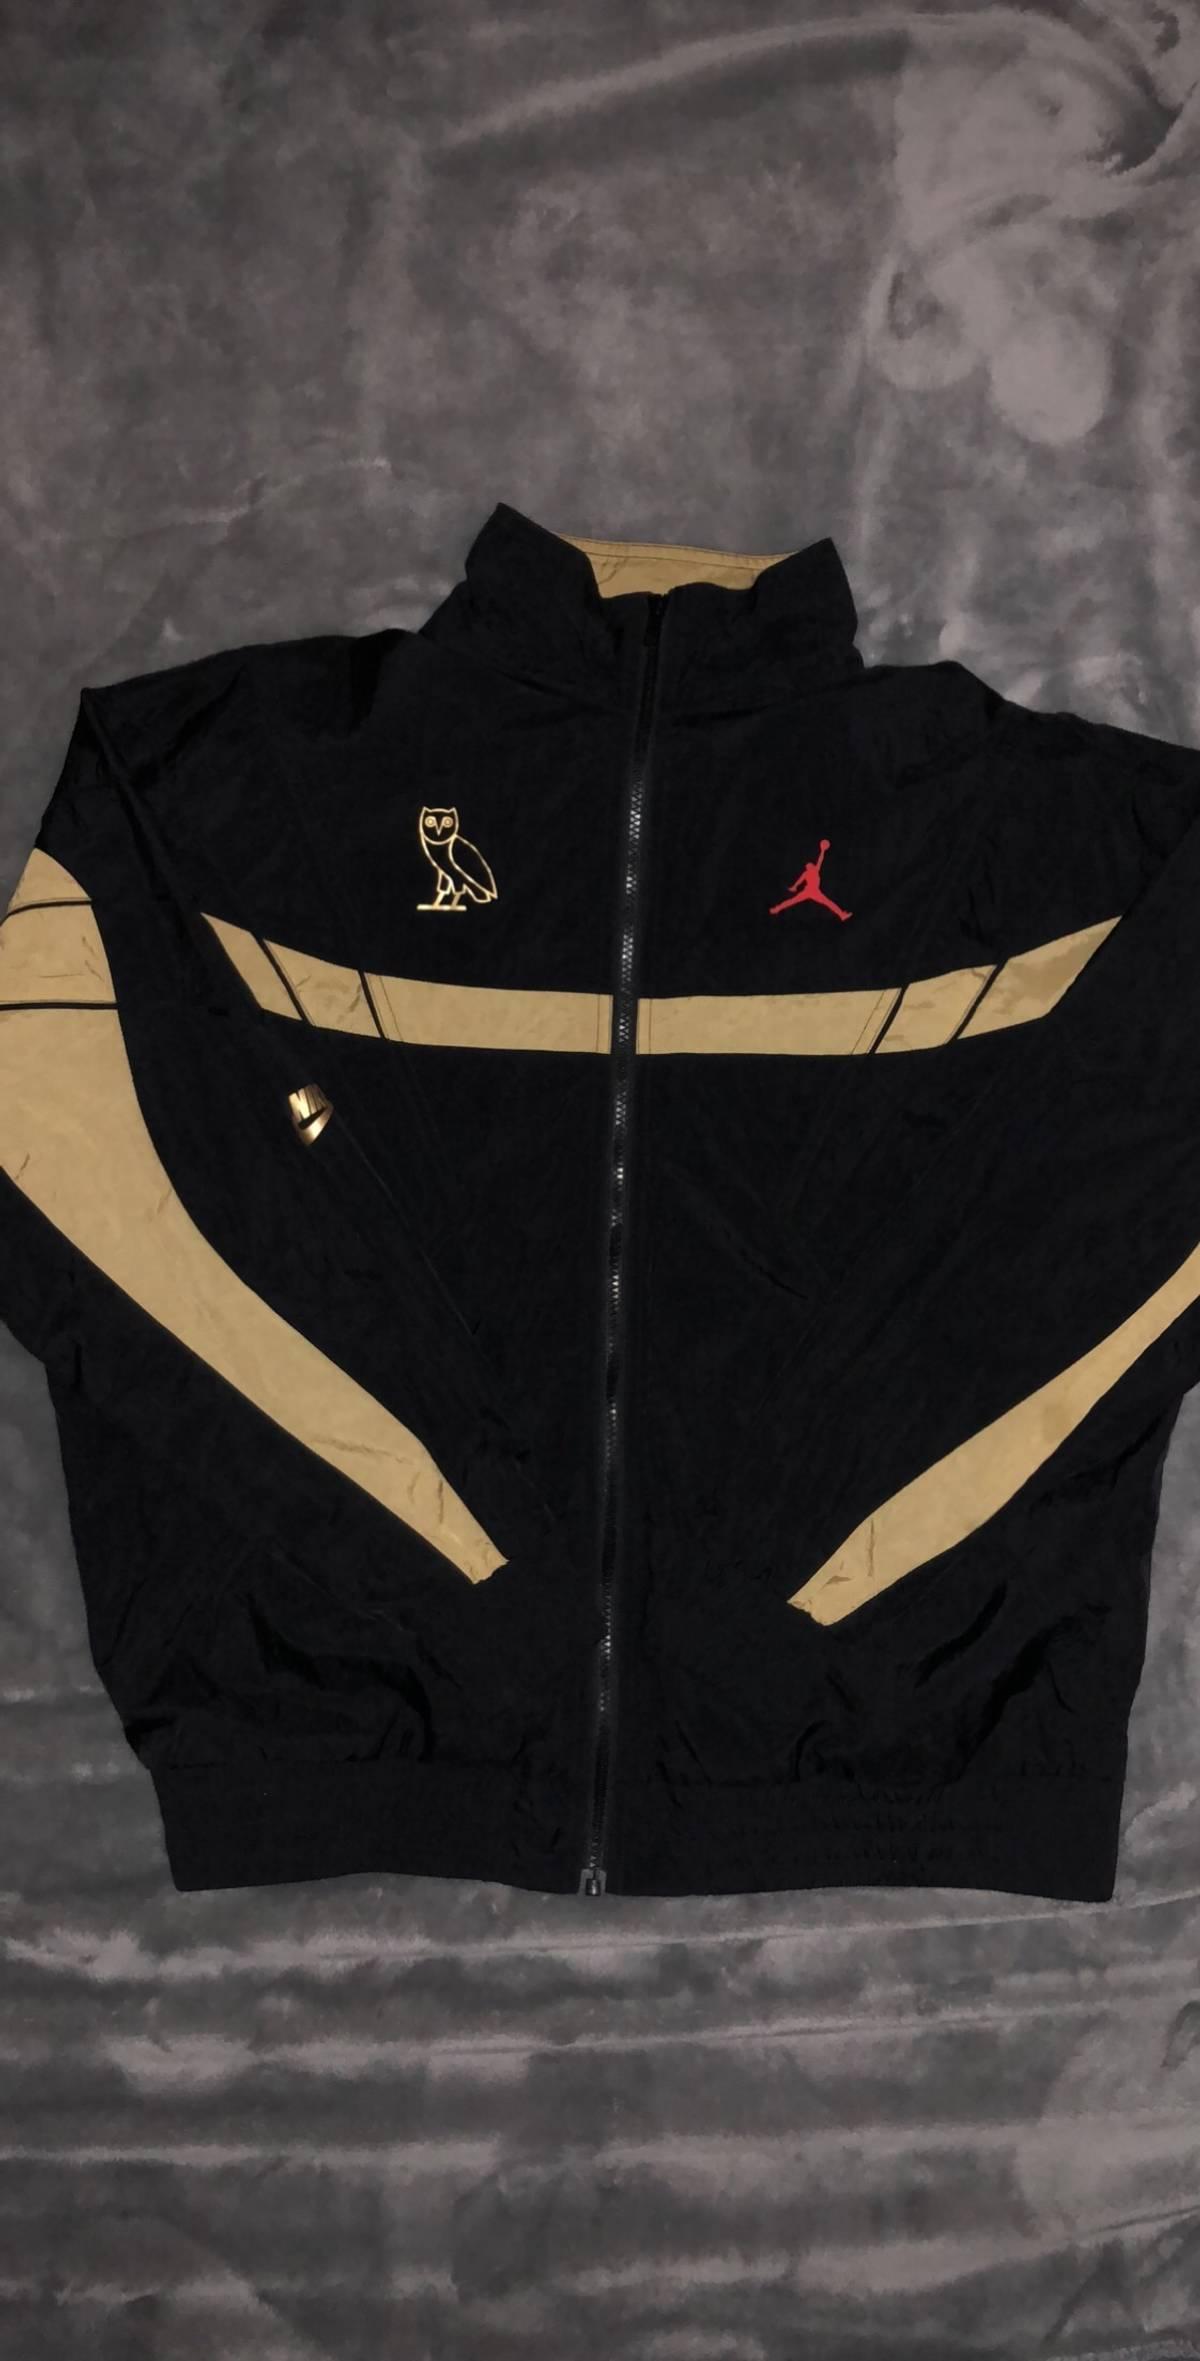 d00fafa6283 Nike × Jordan Brand × Octobers Very Own ×. OVO x Nike x Jordan Jacket